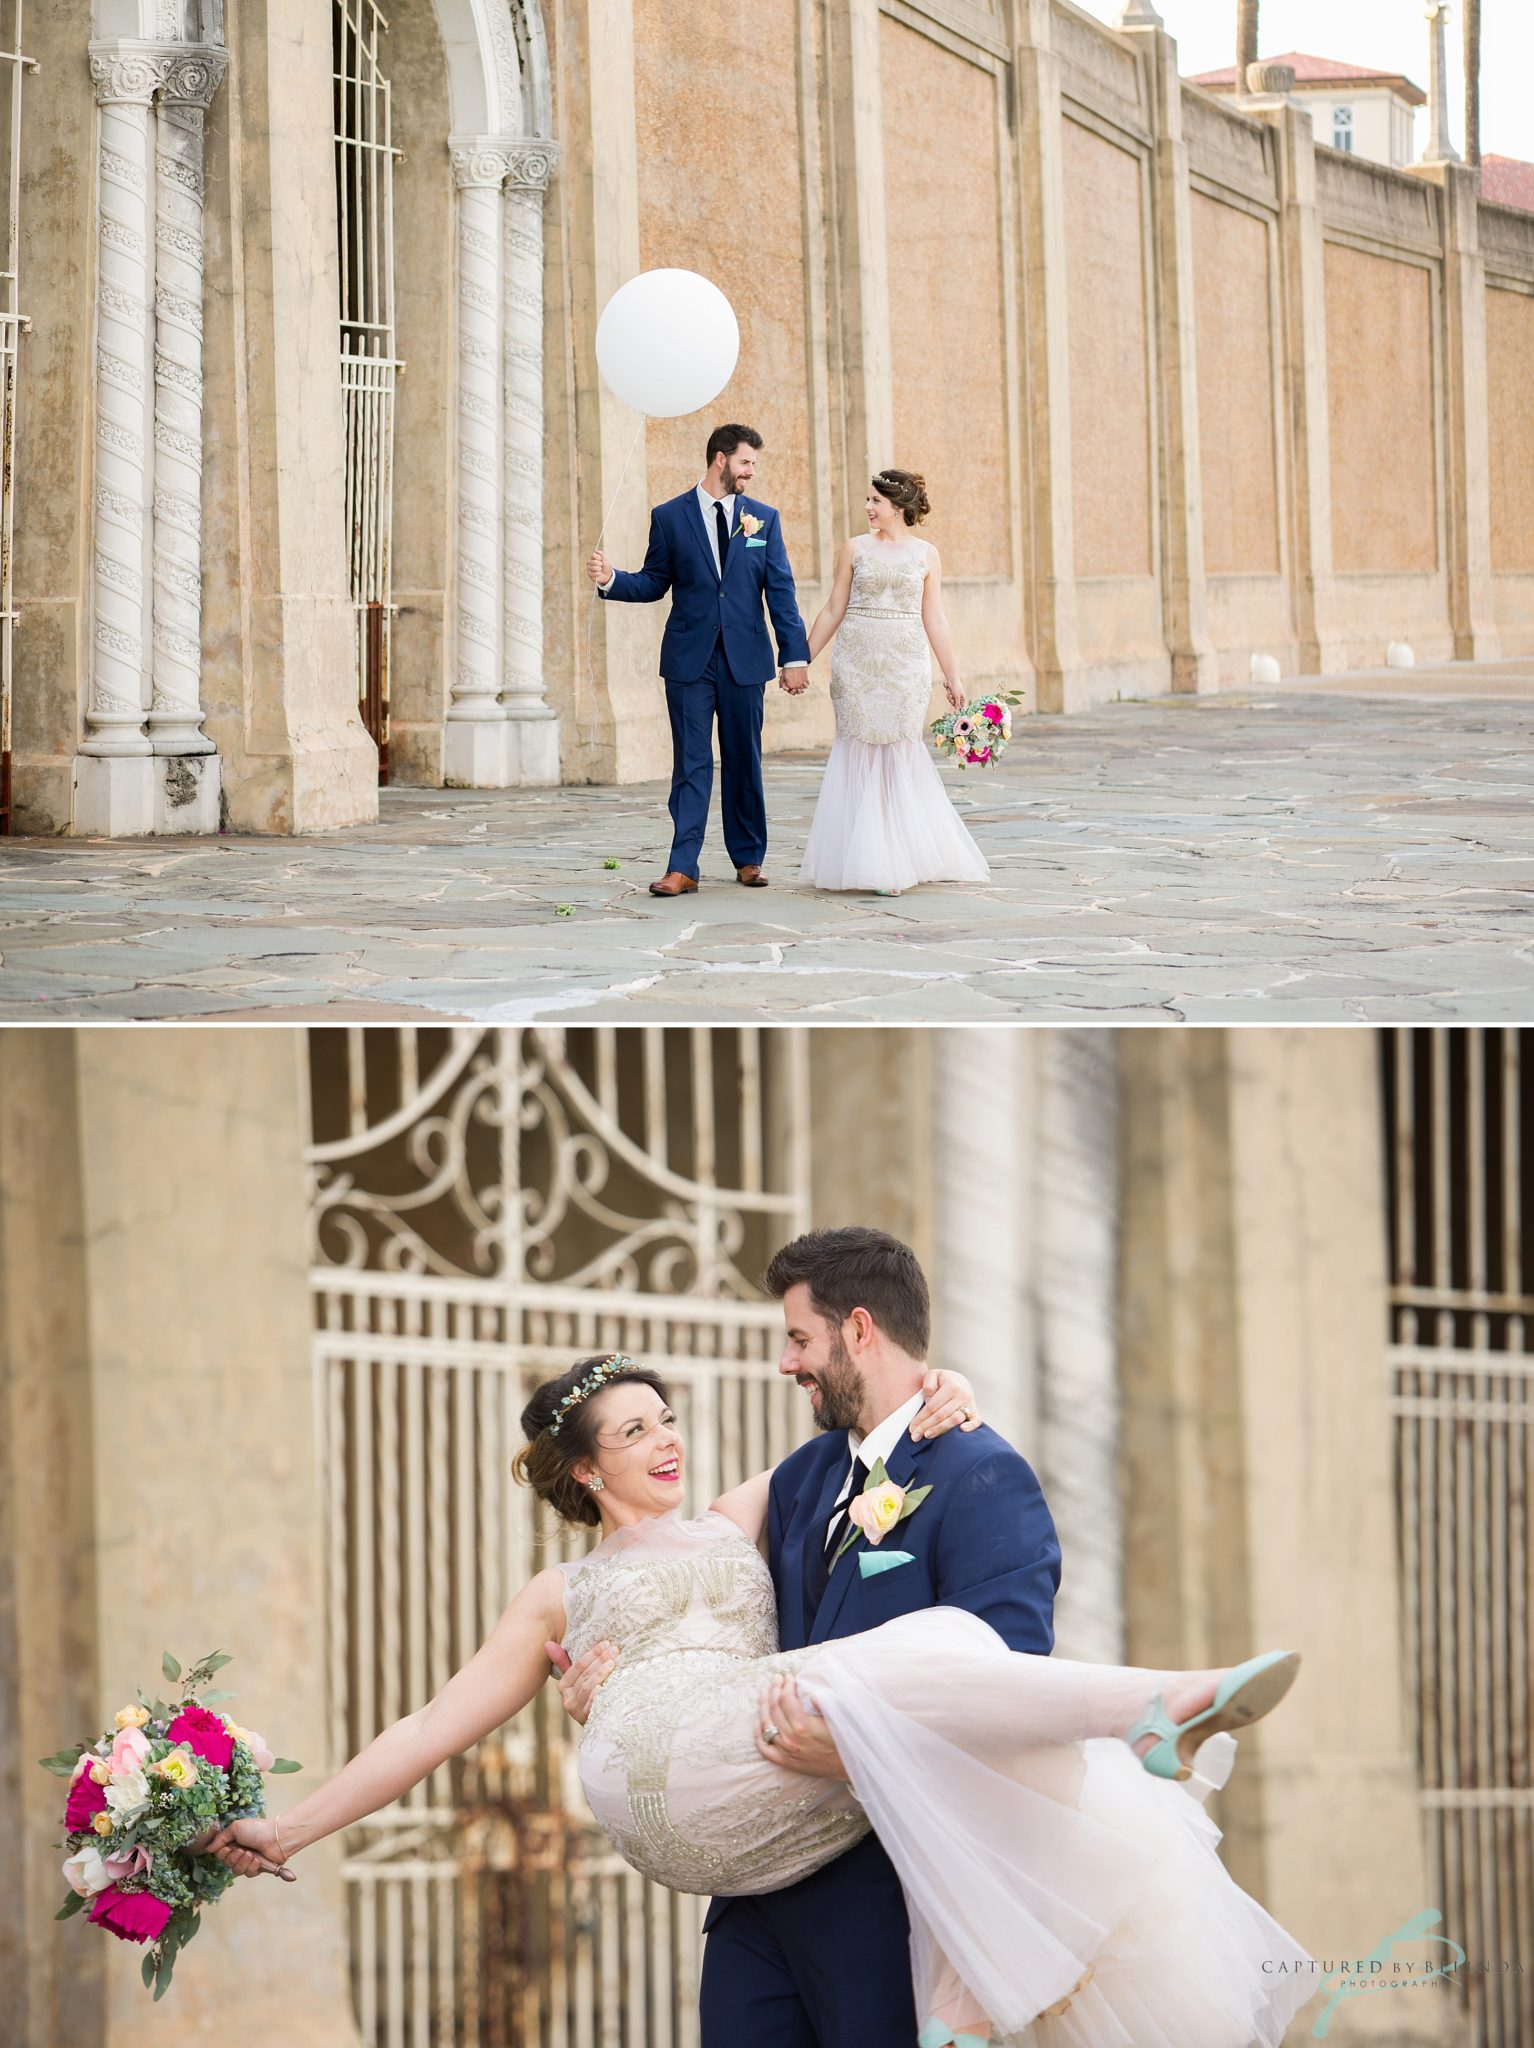 Capture wedding